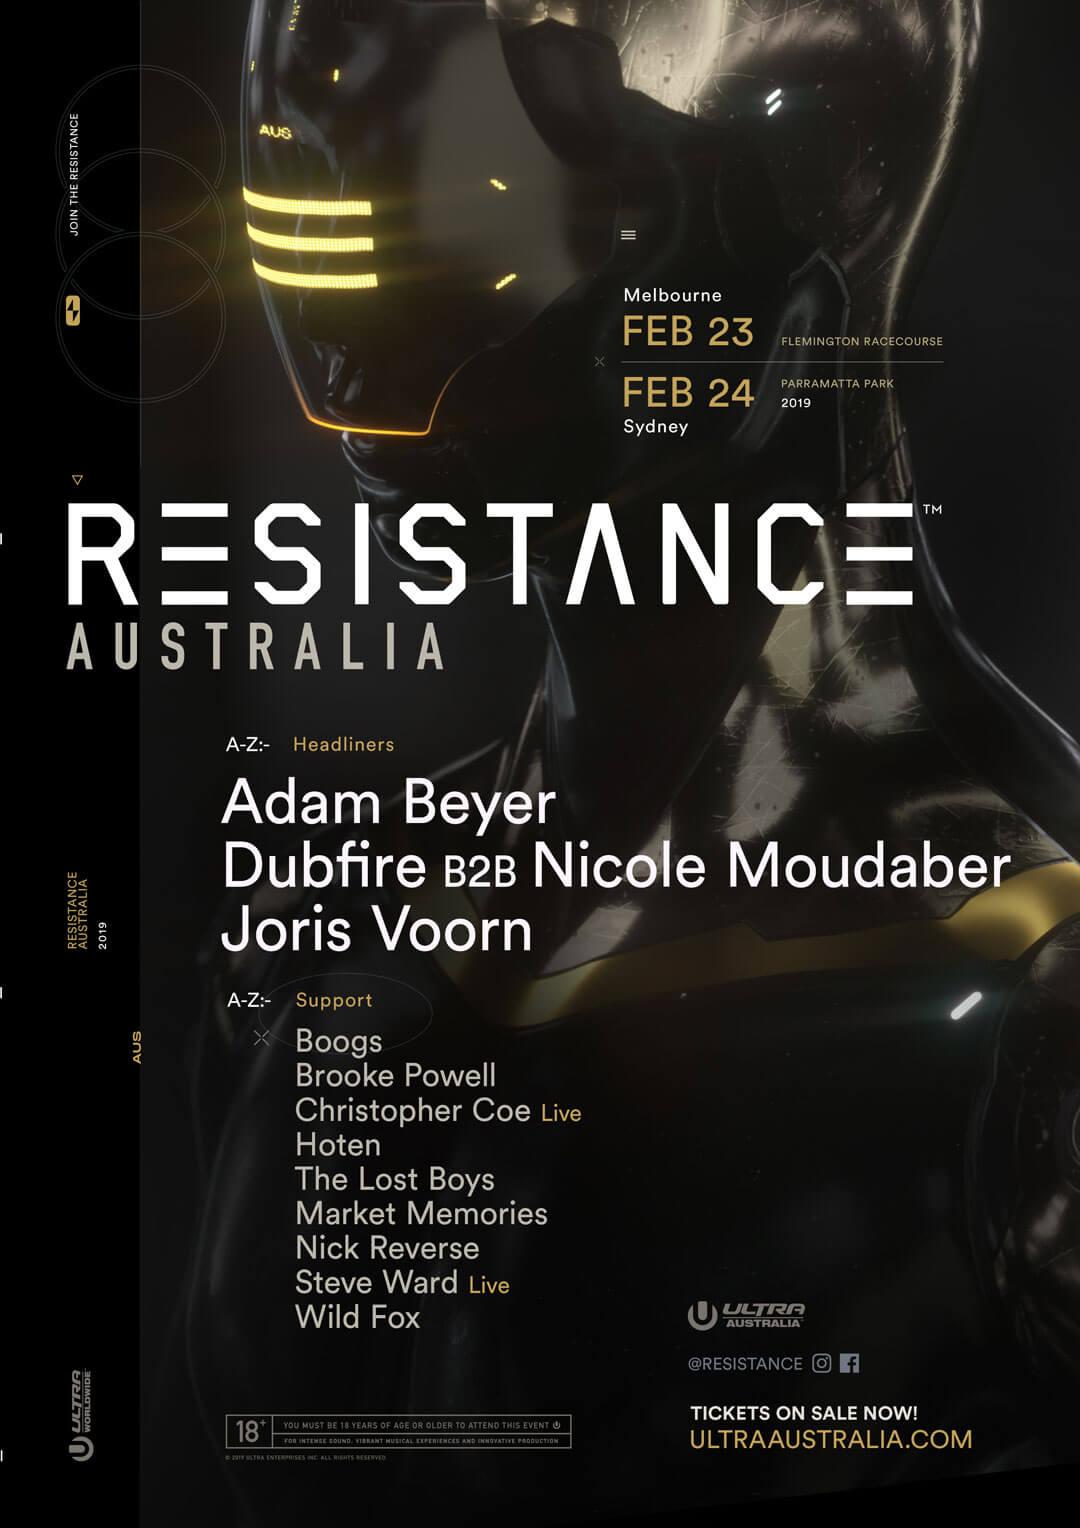 australia-lineup-resistance-2019-1